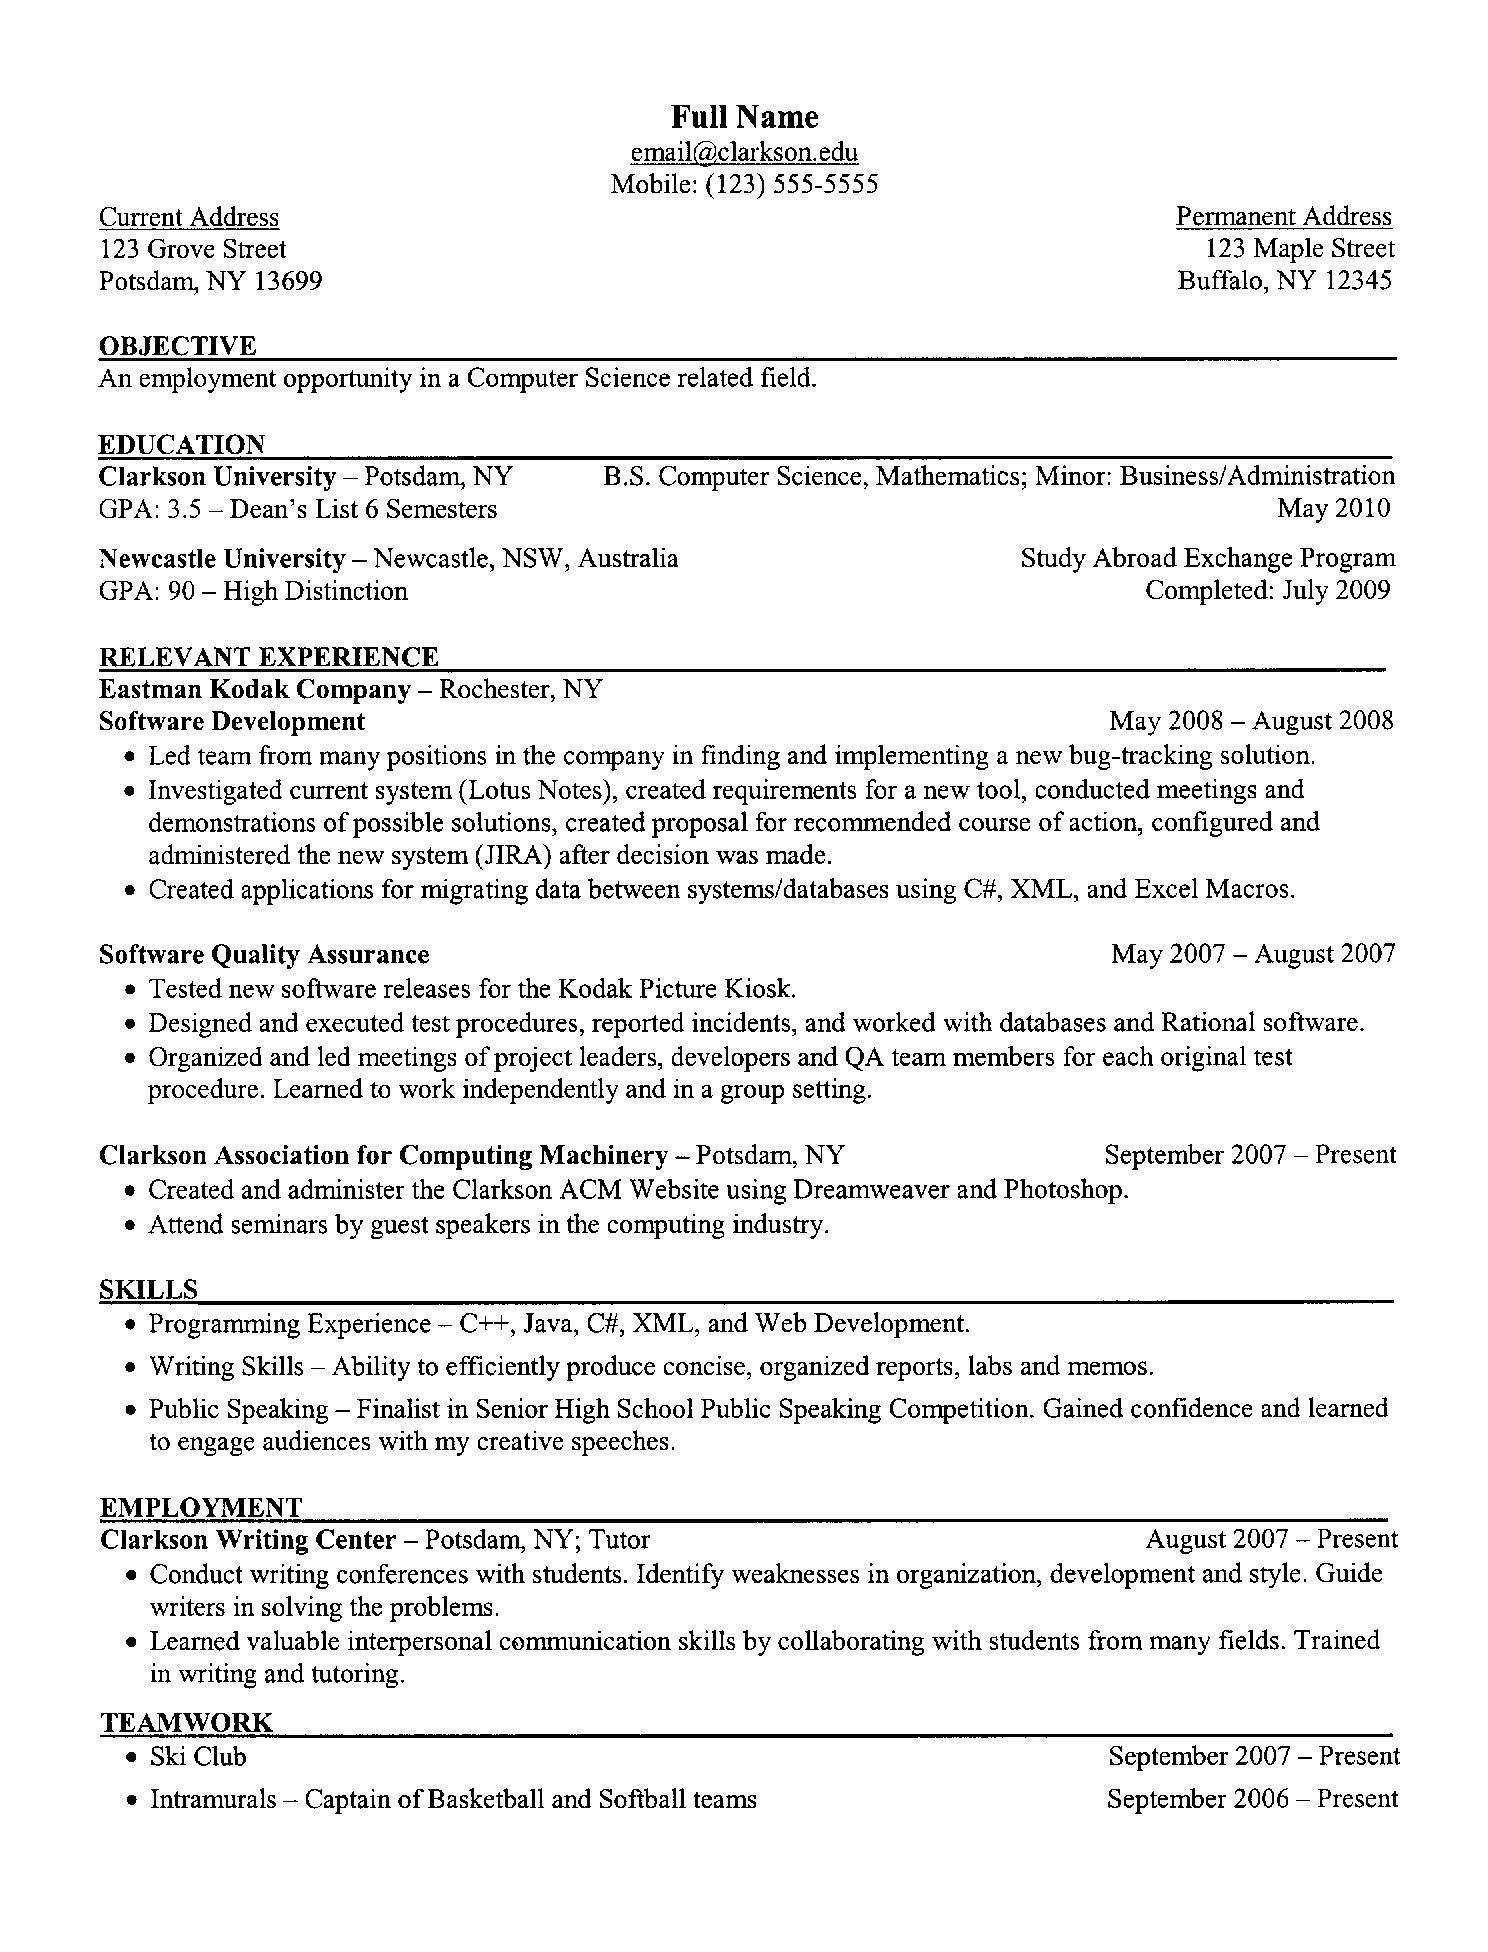 Job Specific Resume Templates Adorable Usa  Pinterest  Cover Letter Sample Letter Sample And Resume Cv